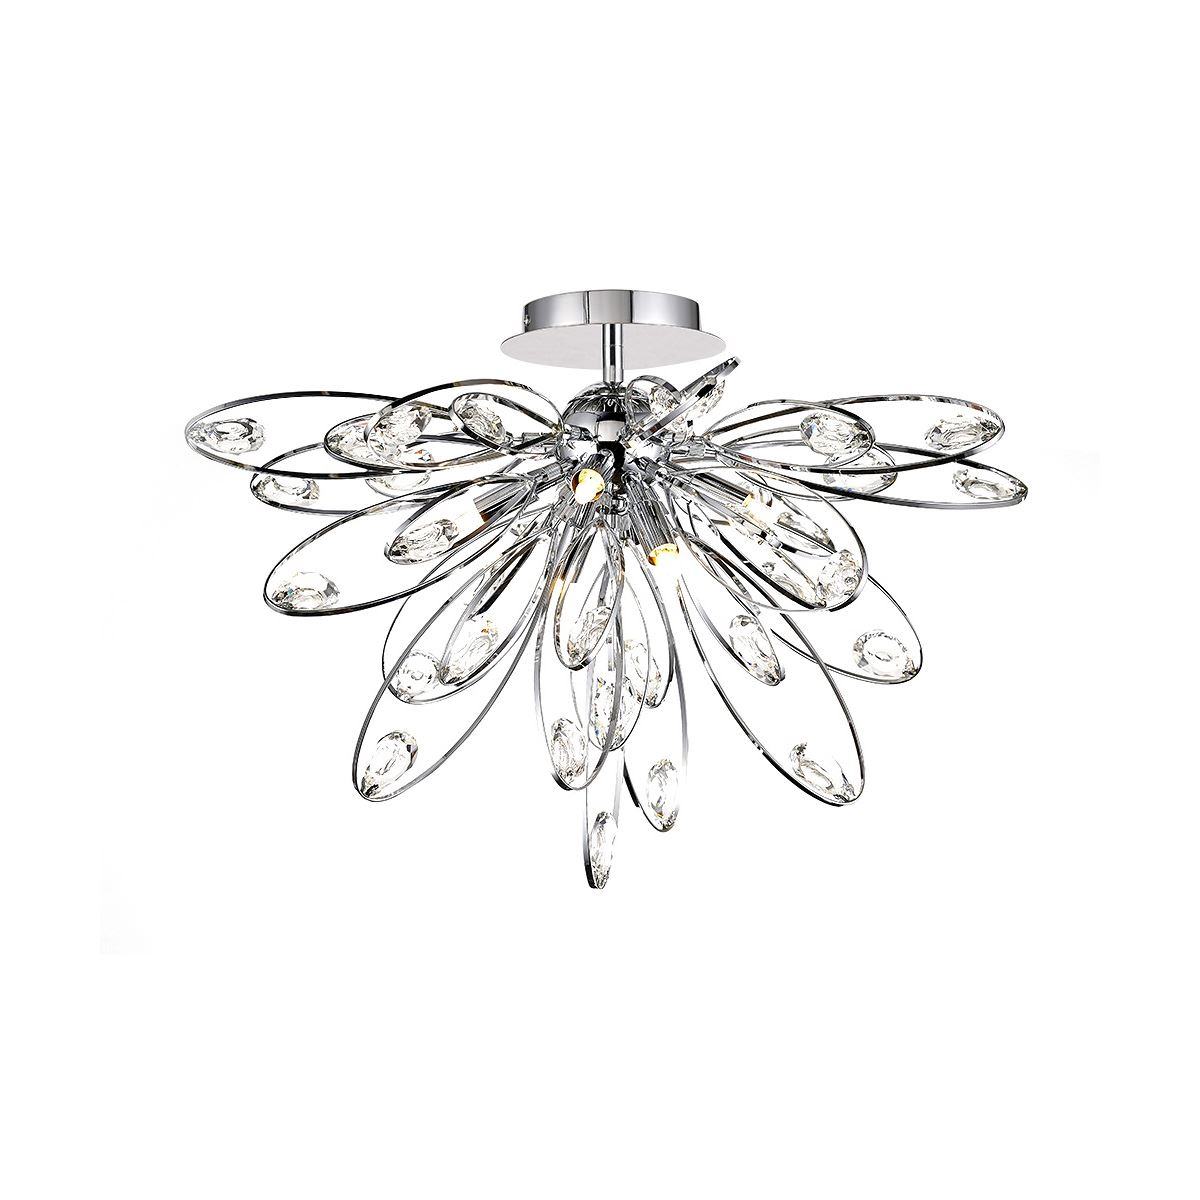 Diyas IL31645 Harlow Ceiling 6 Light G9 Polished Chrome/Crystal